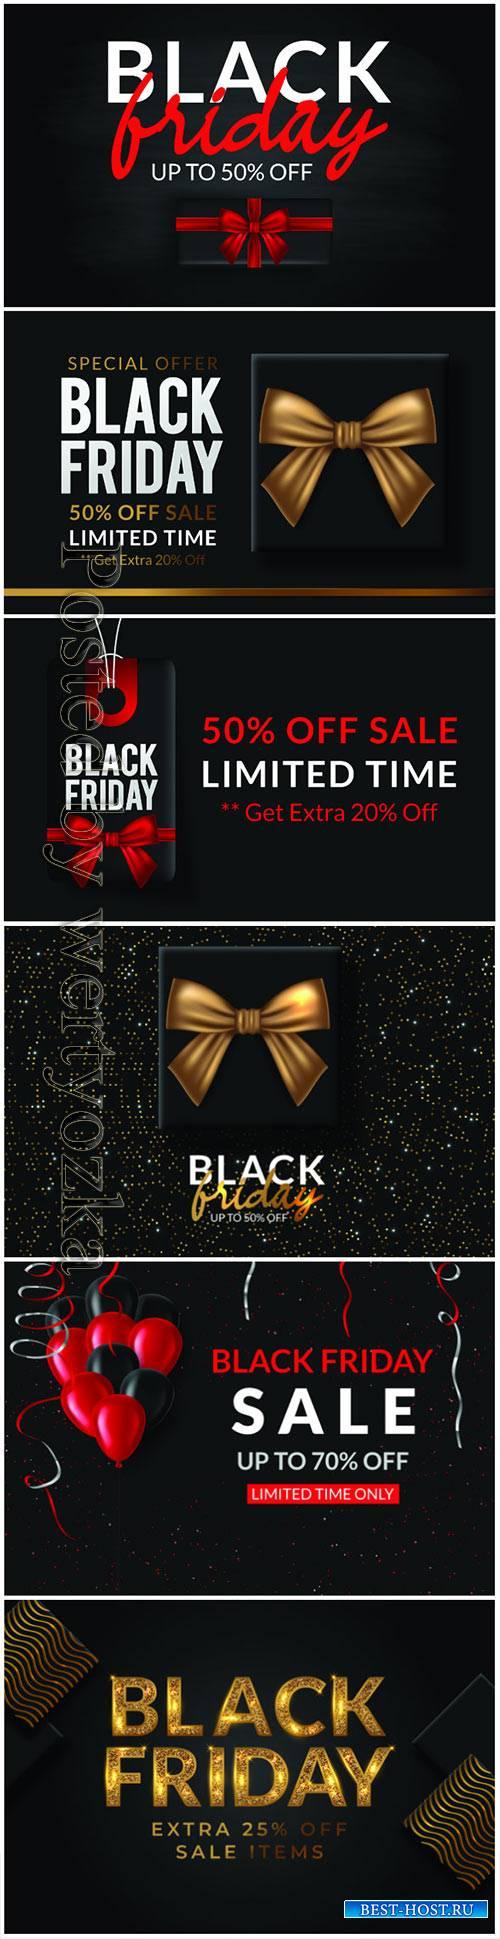 Vector poster Black Friday Sale on dark background